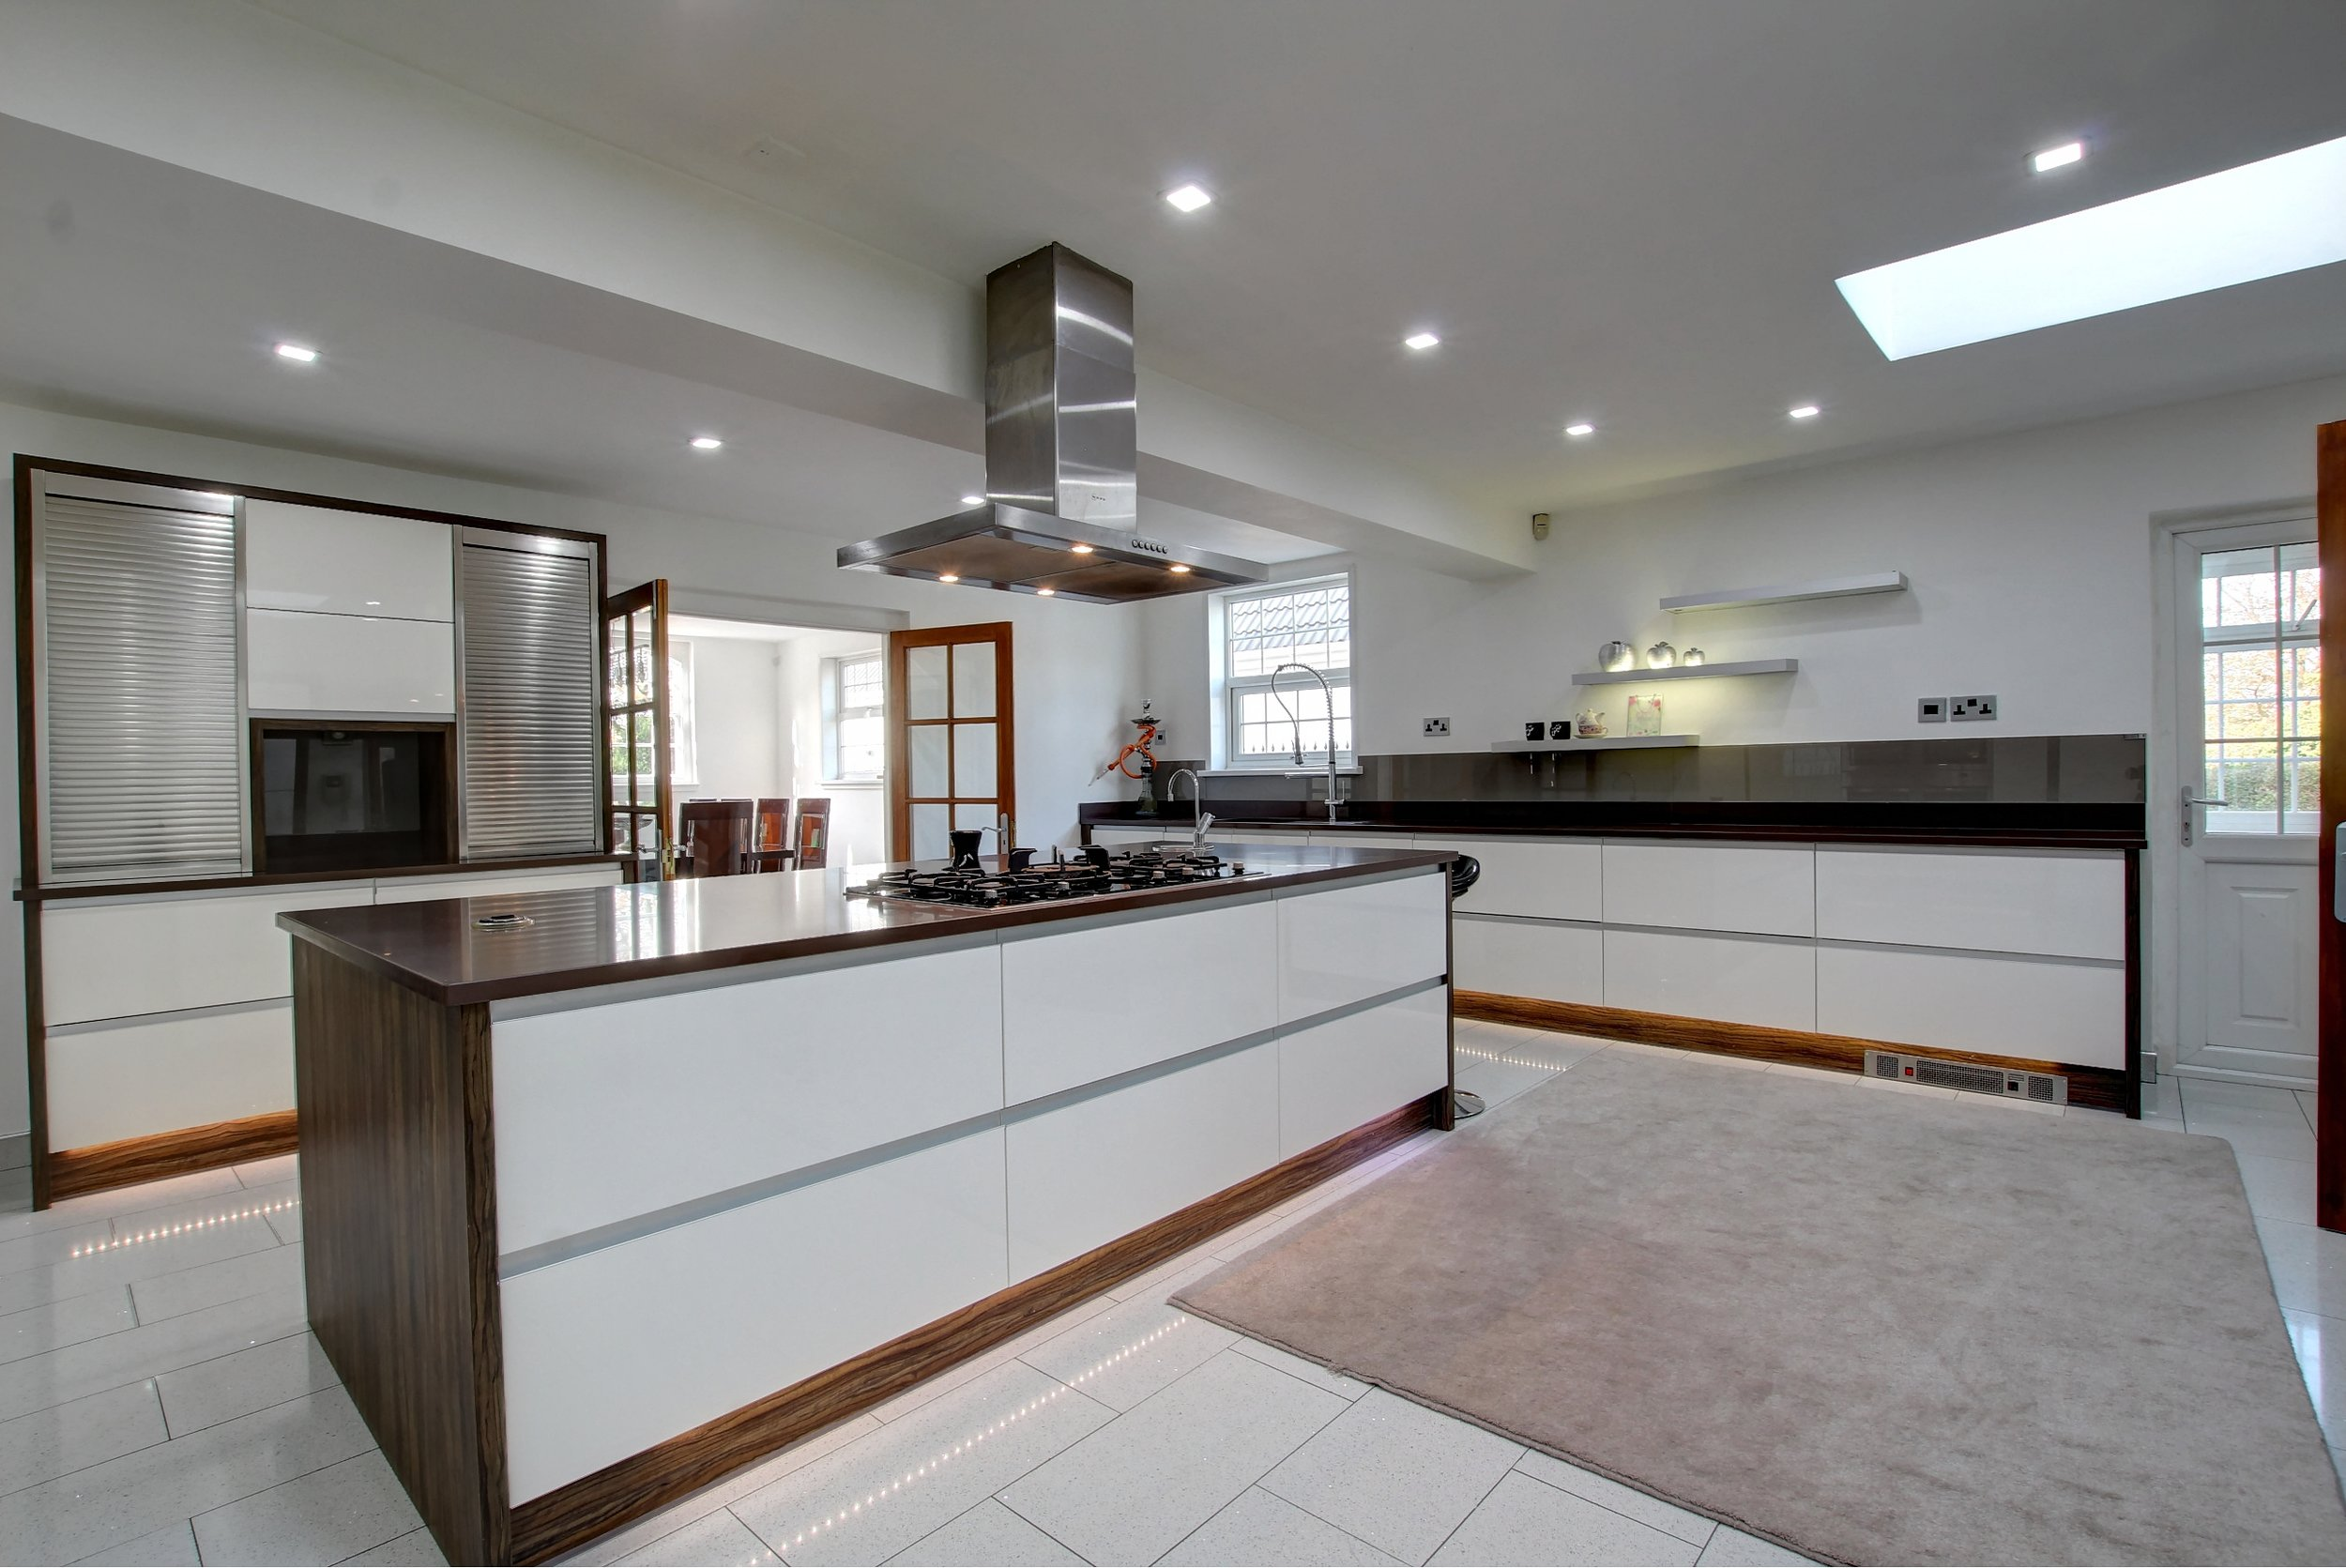 31 kitchen i.jpg